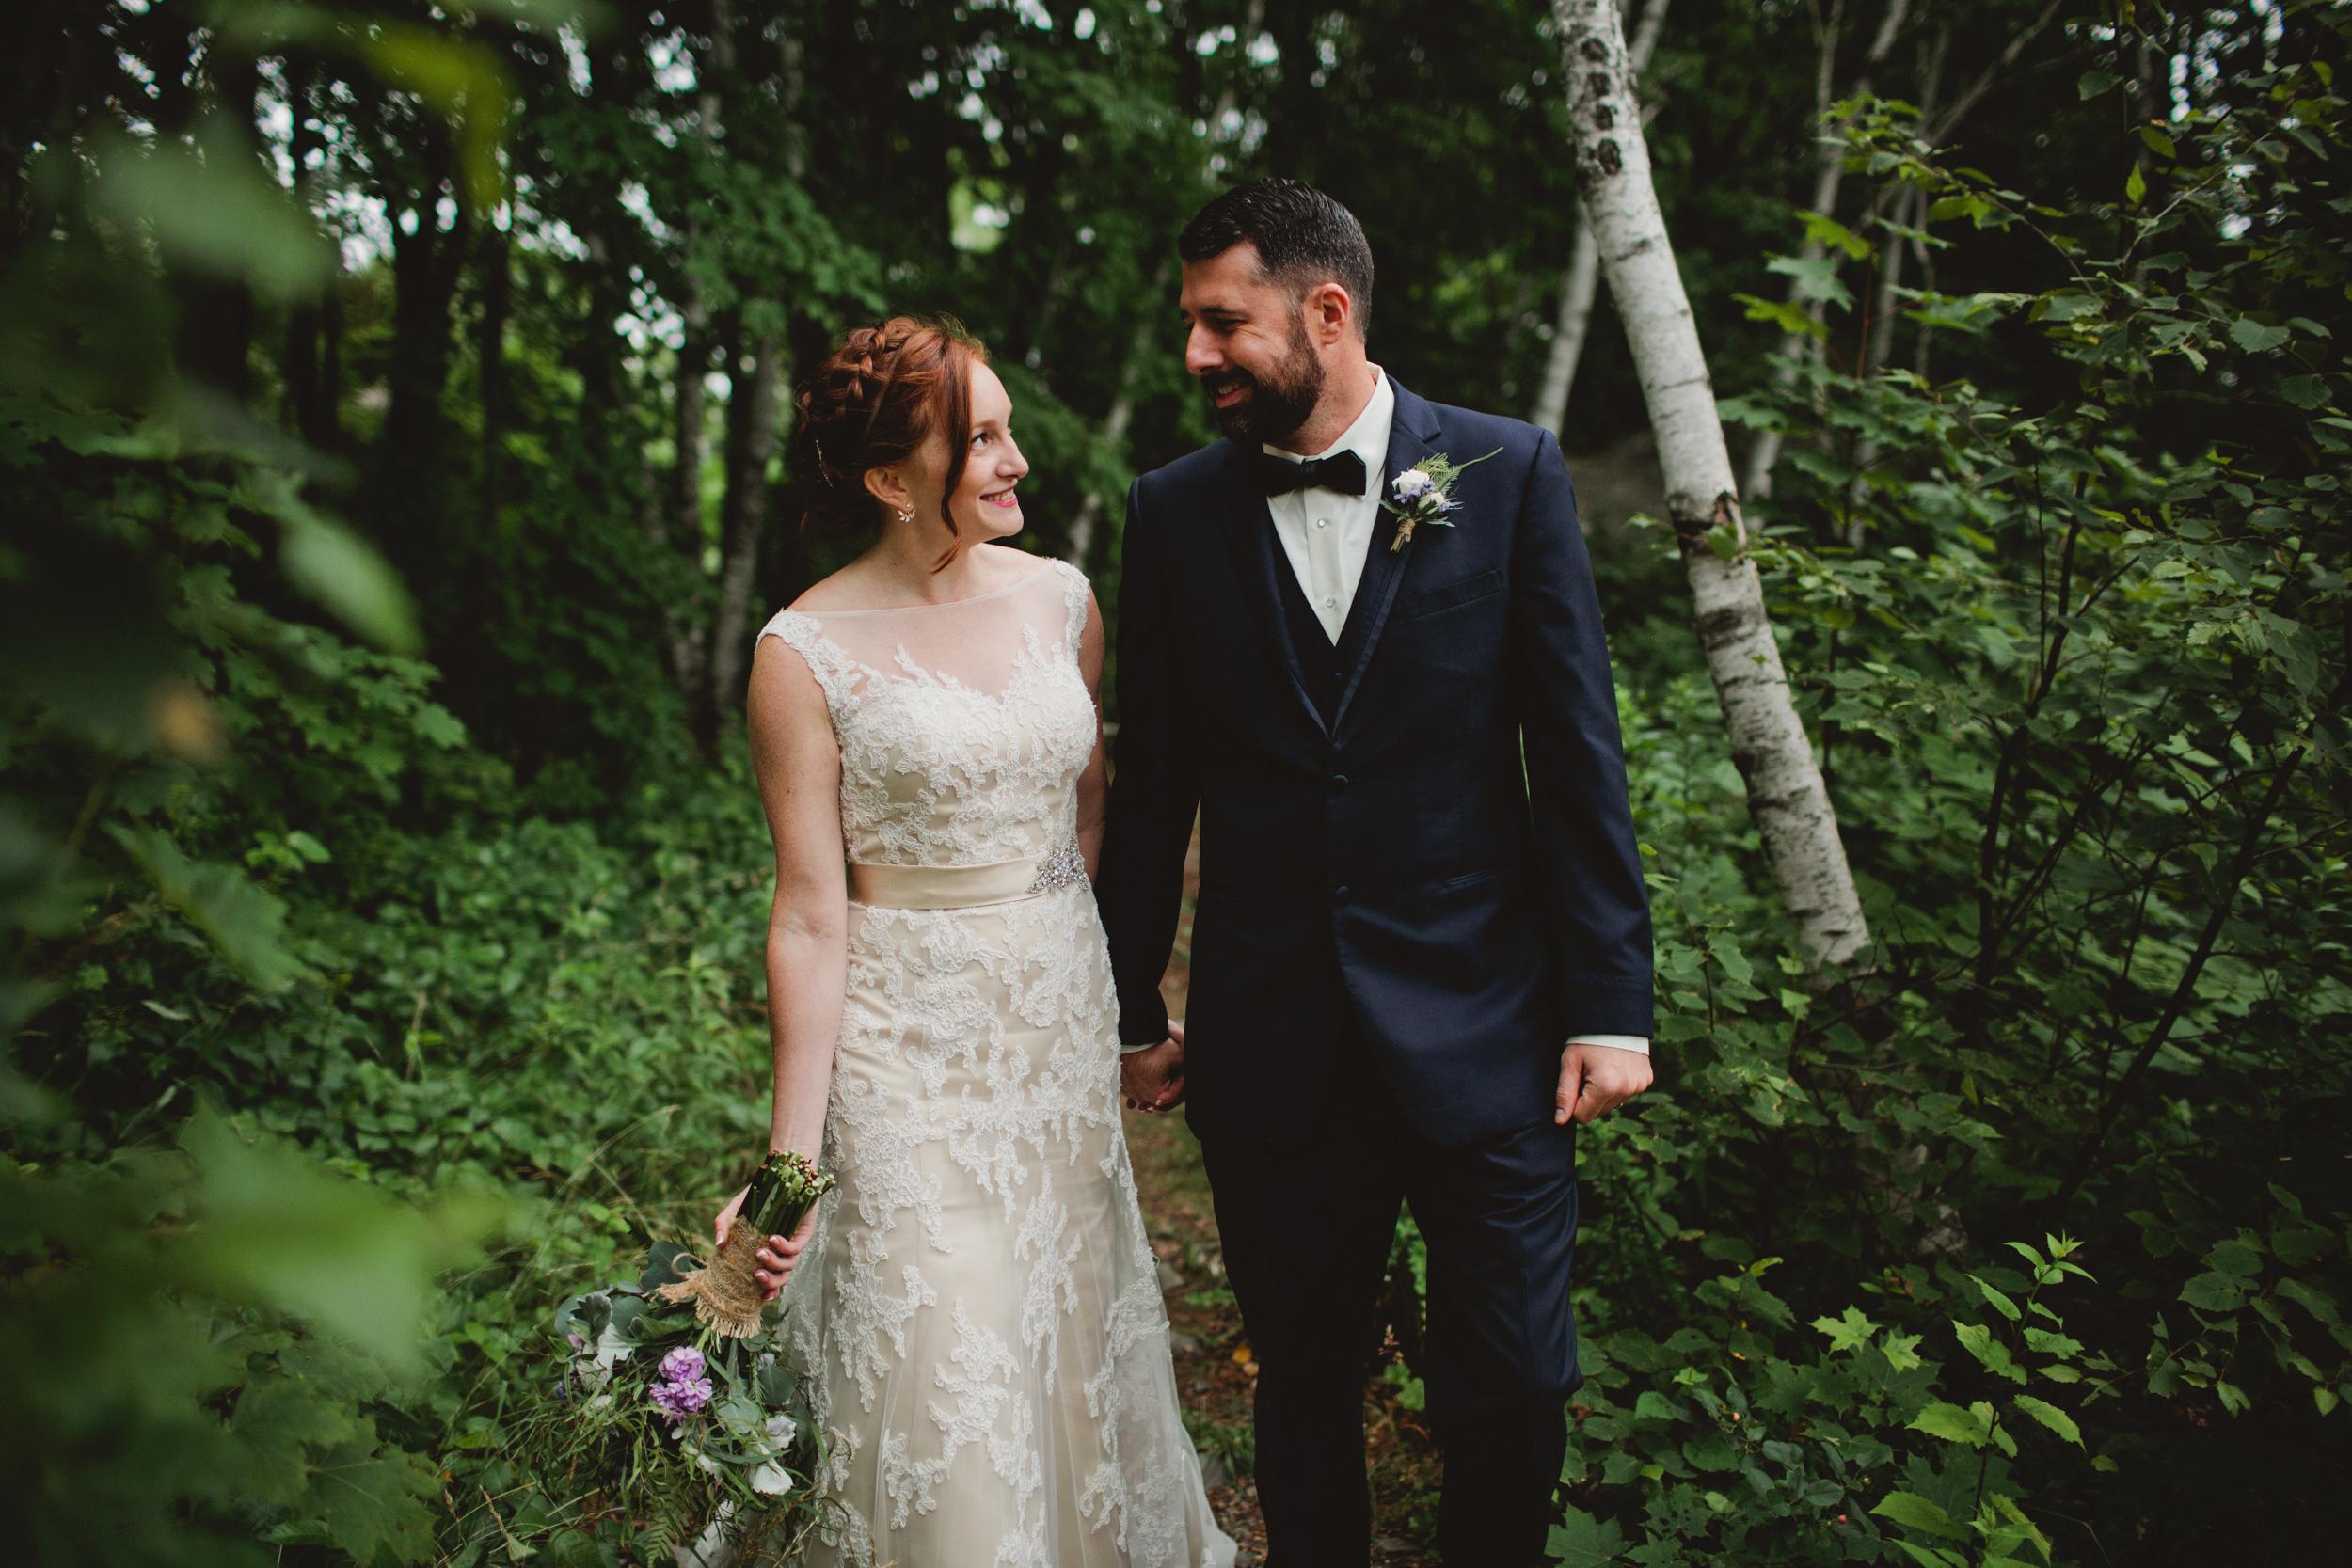 Portland-Maine-Wedding-5.jpg